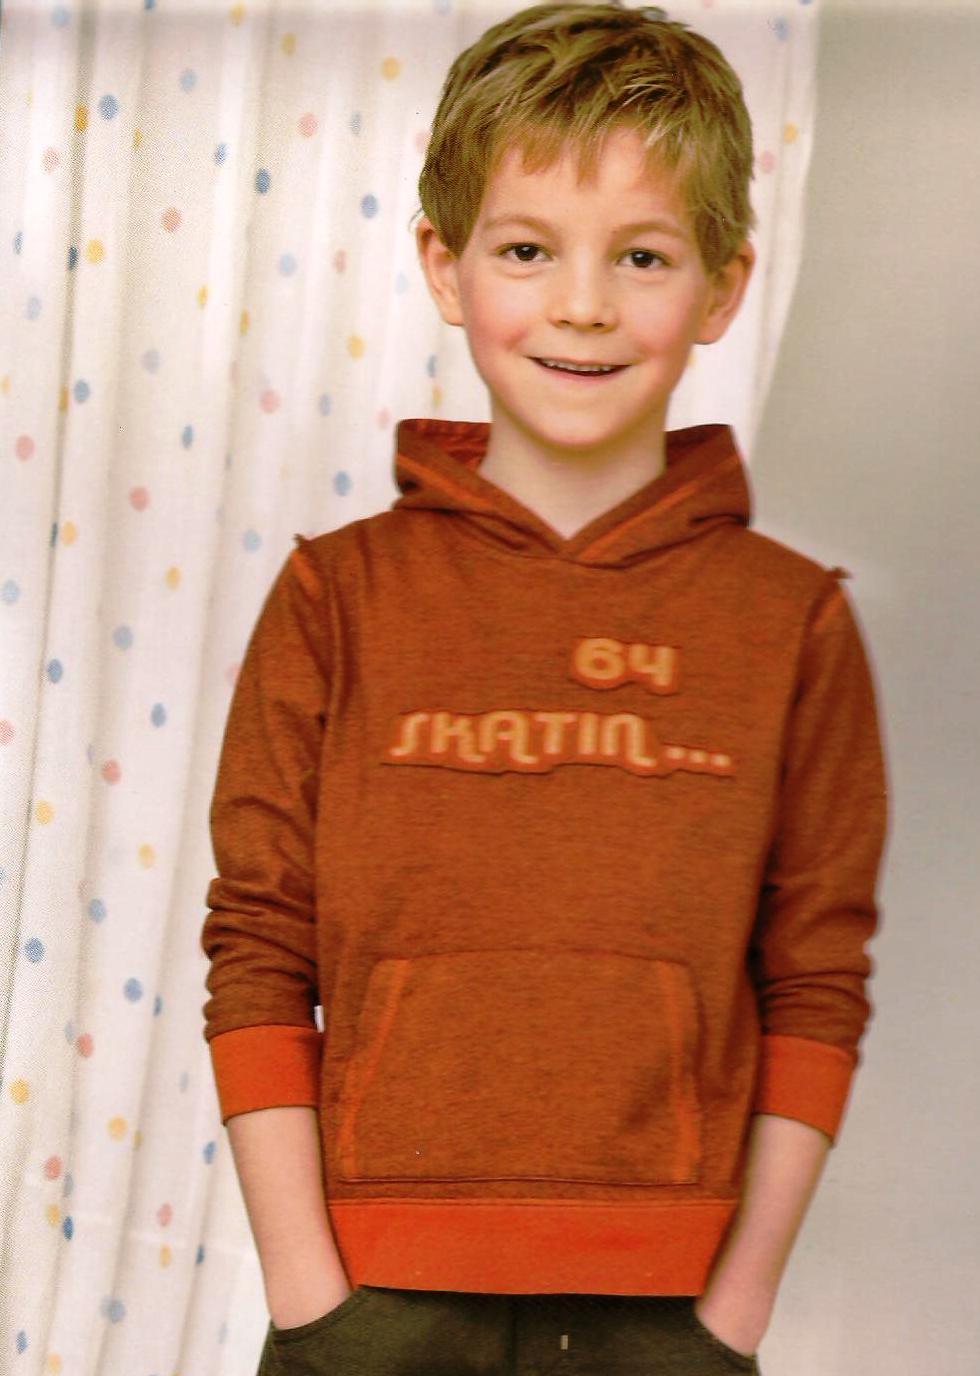 biete kapuzen sweatshirt f r jungen gr 110 116 kleidung kinder teens jungen pullover. Black Bedroom Furniture Sets. Home Design Ideas